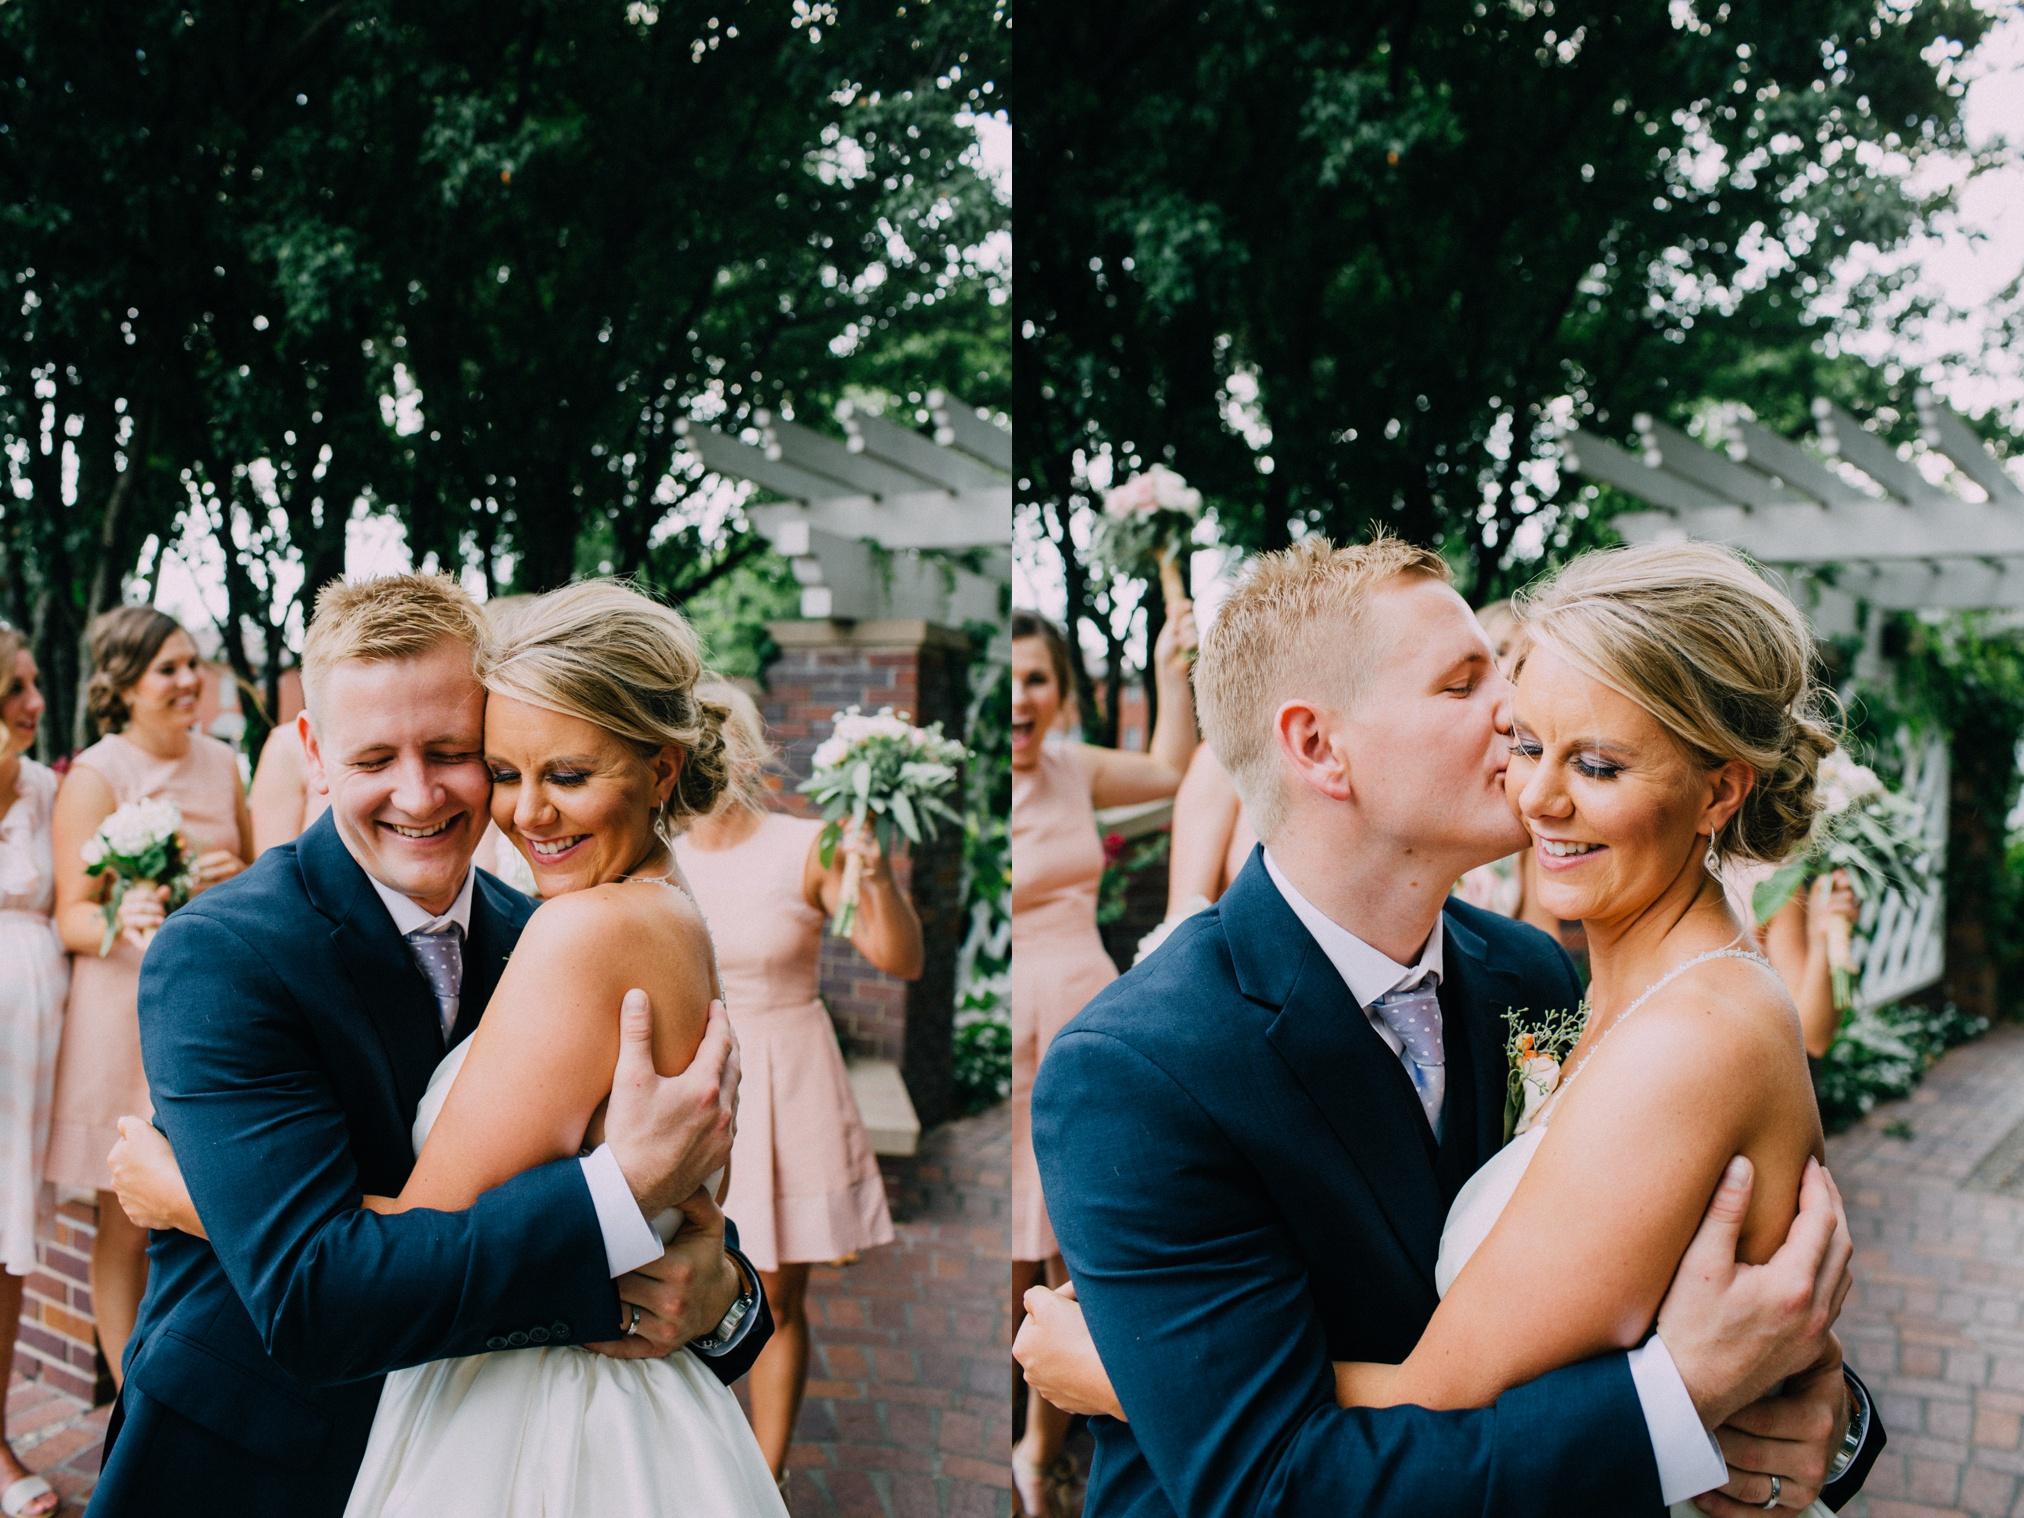 brenna+michael_wedding-514.jpg